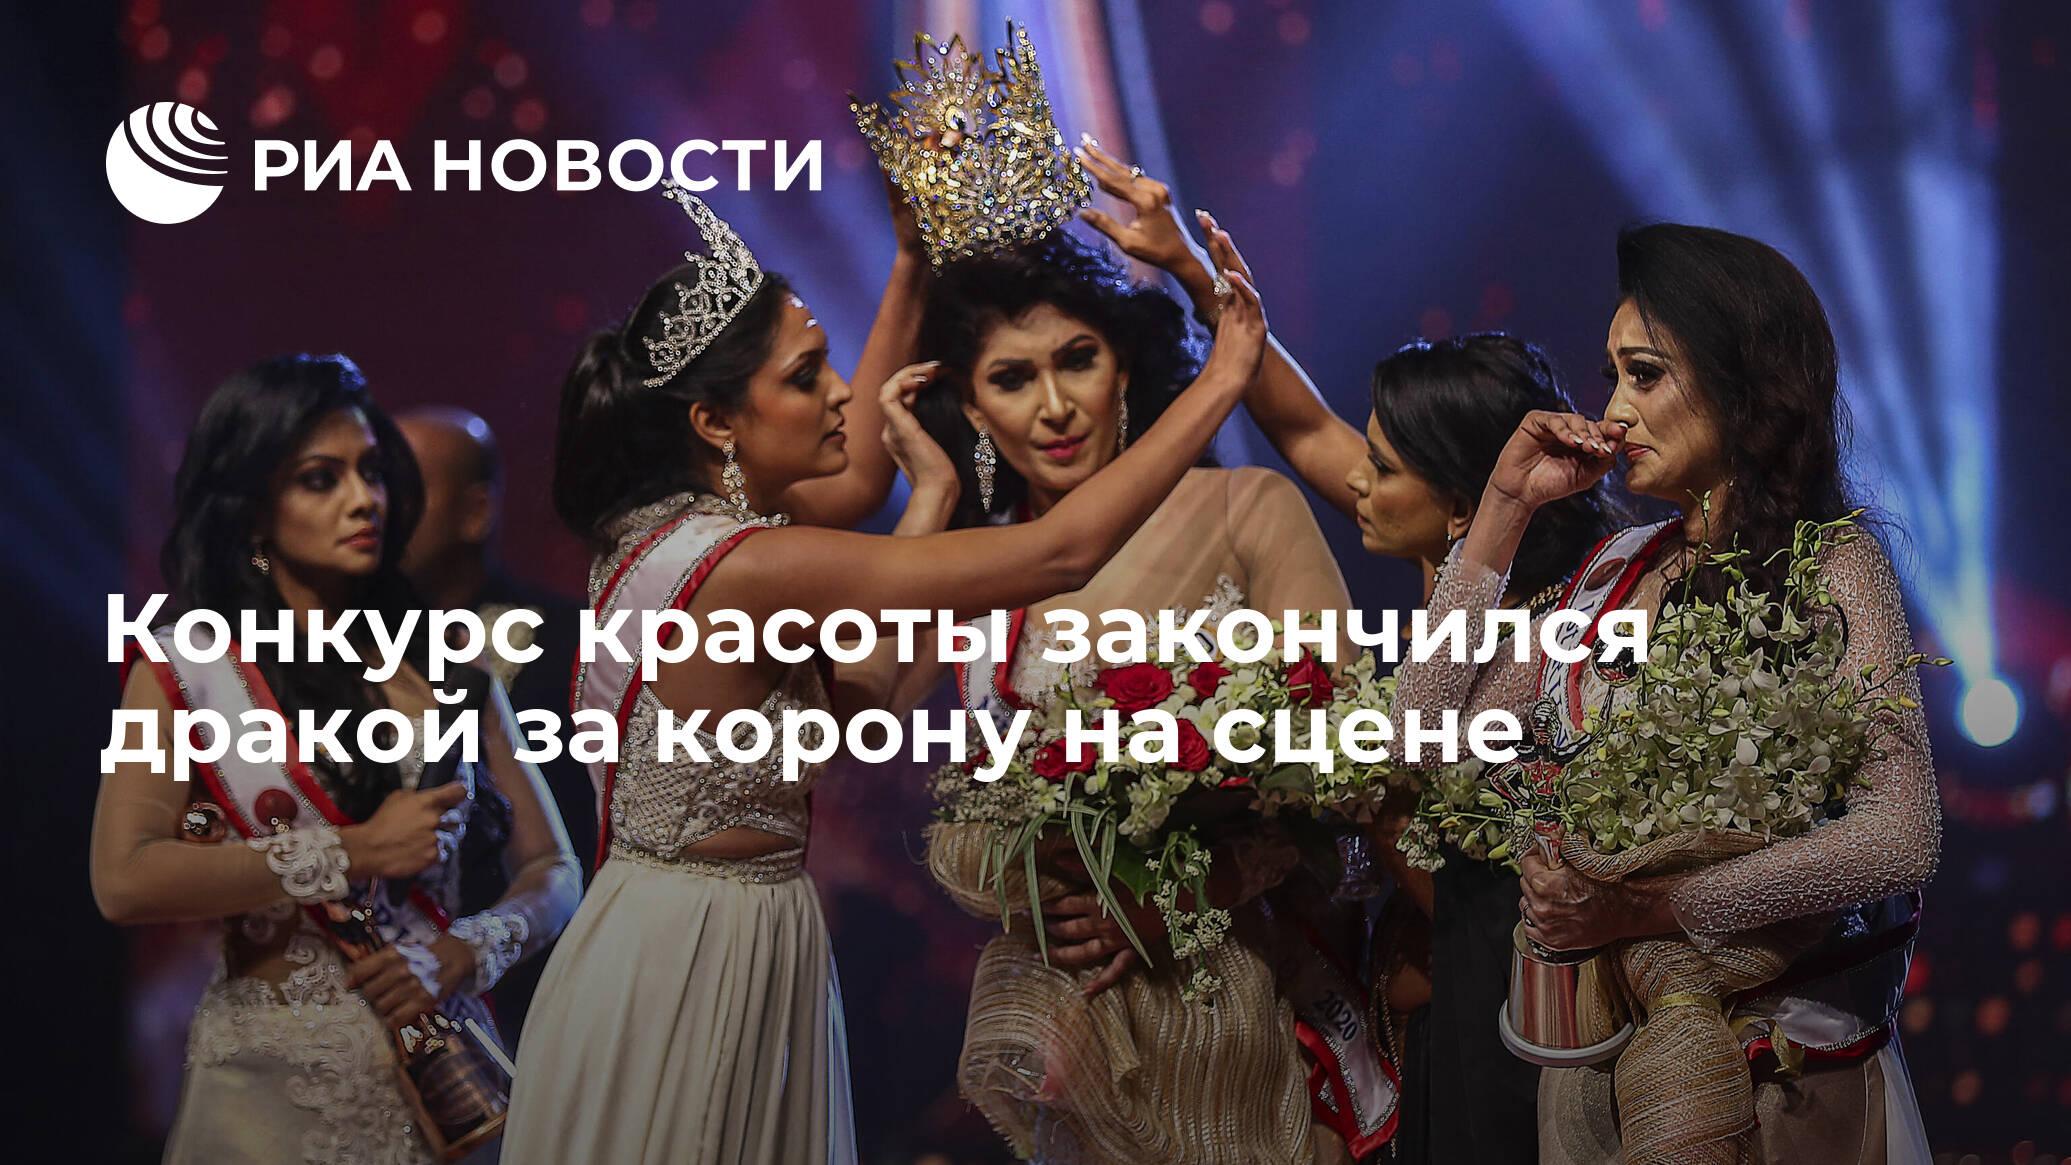 Конкурс красоты закончился дракой за корону на сцене